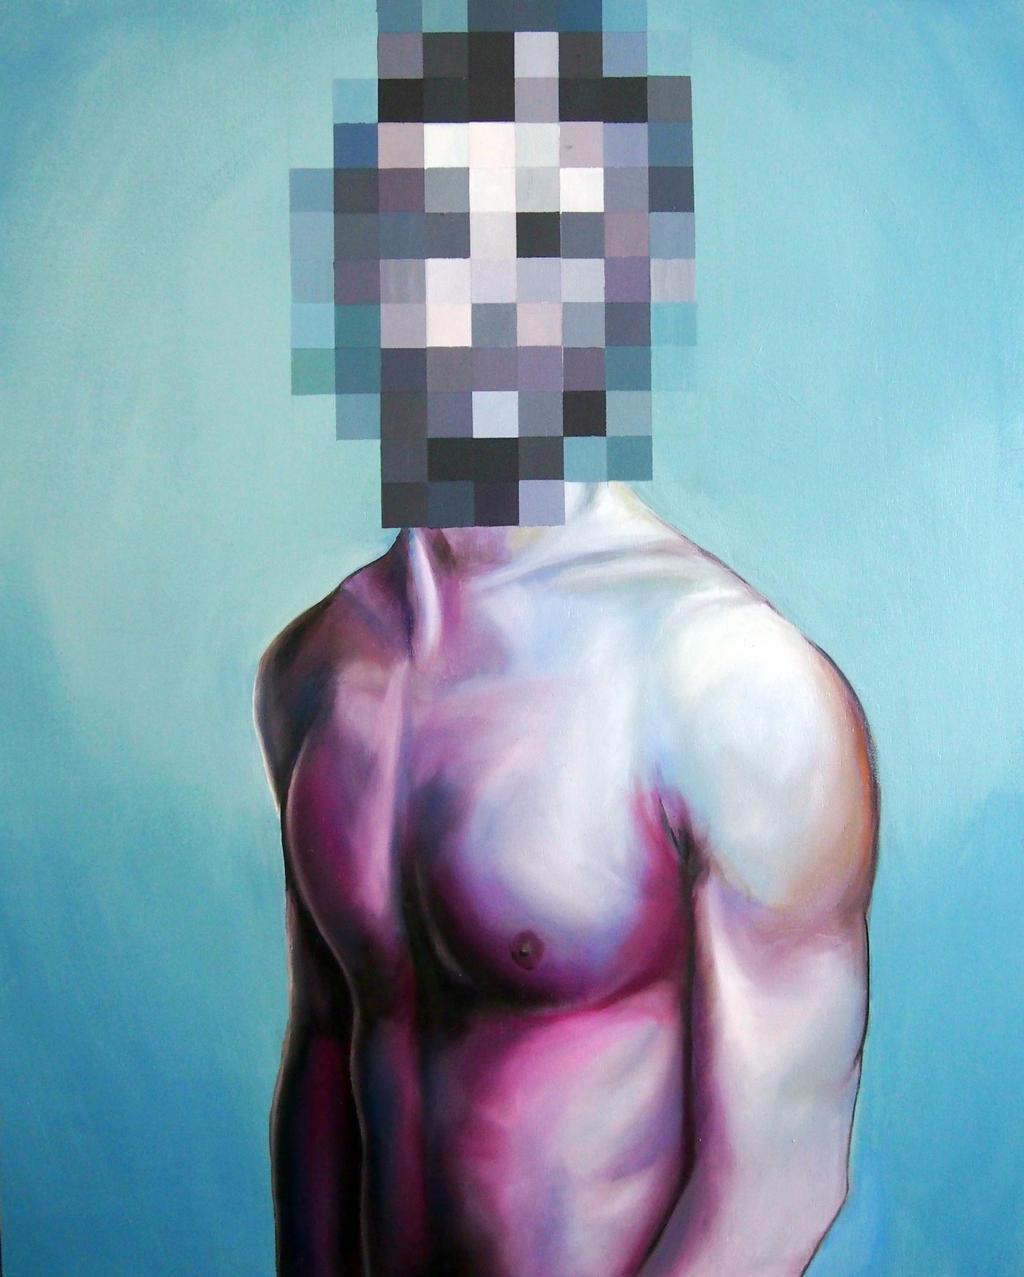 Censored by vivapo